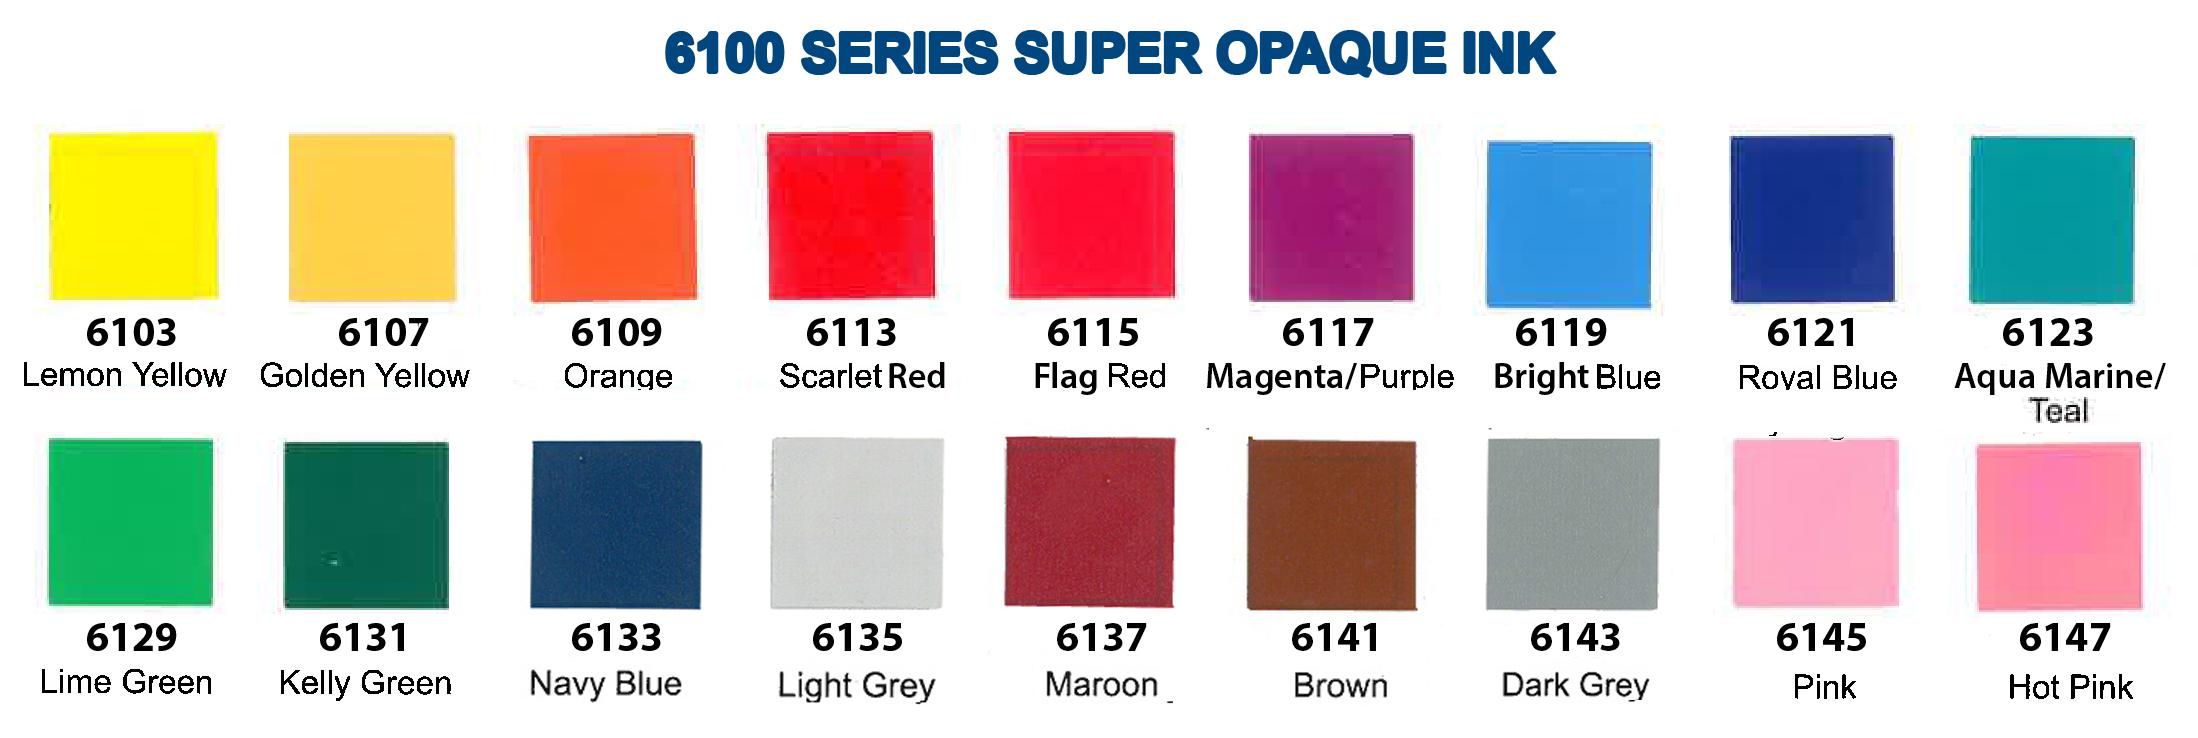 6100-color-chart.jpg